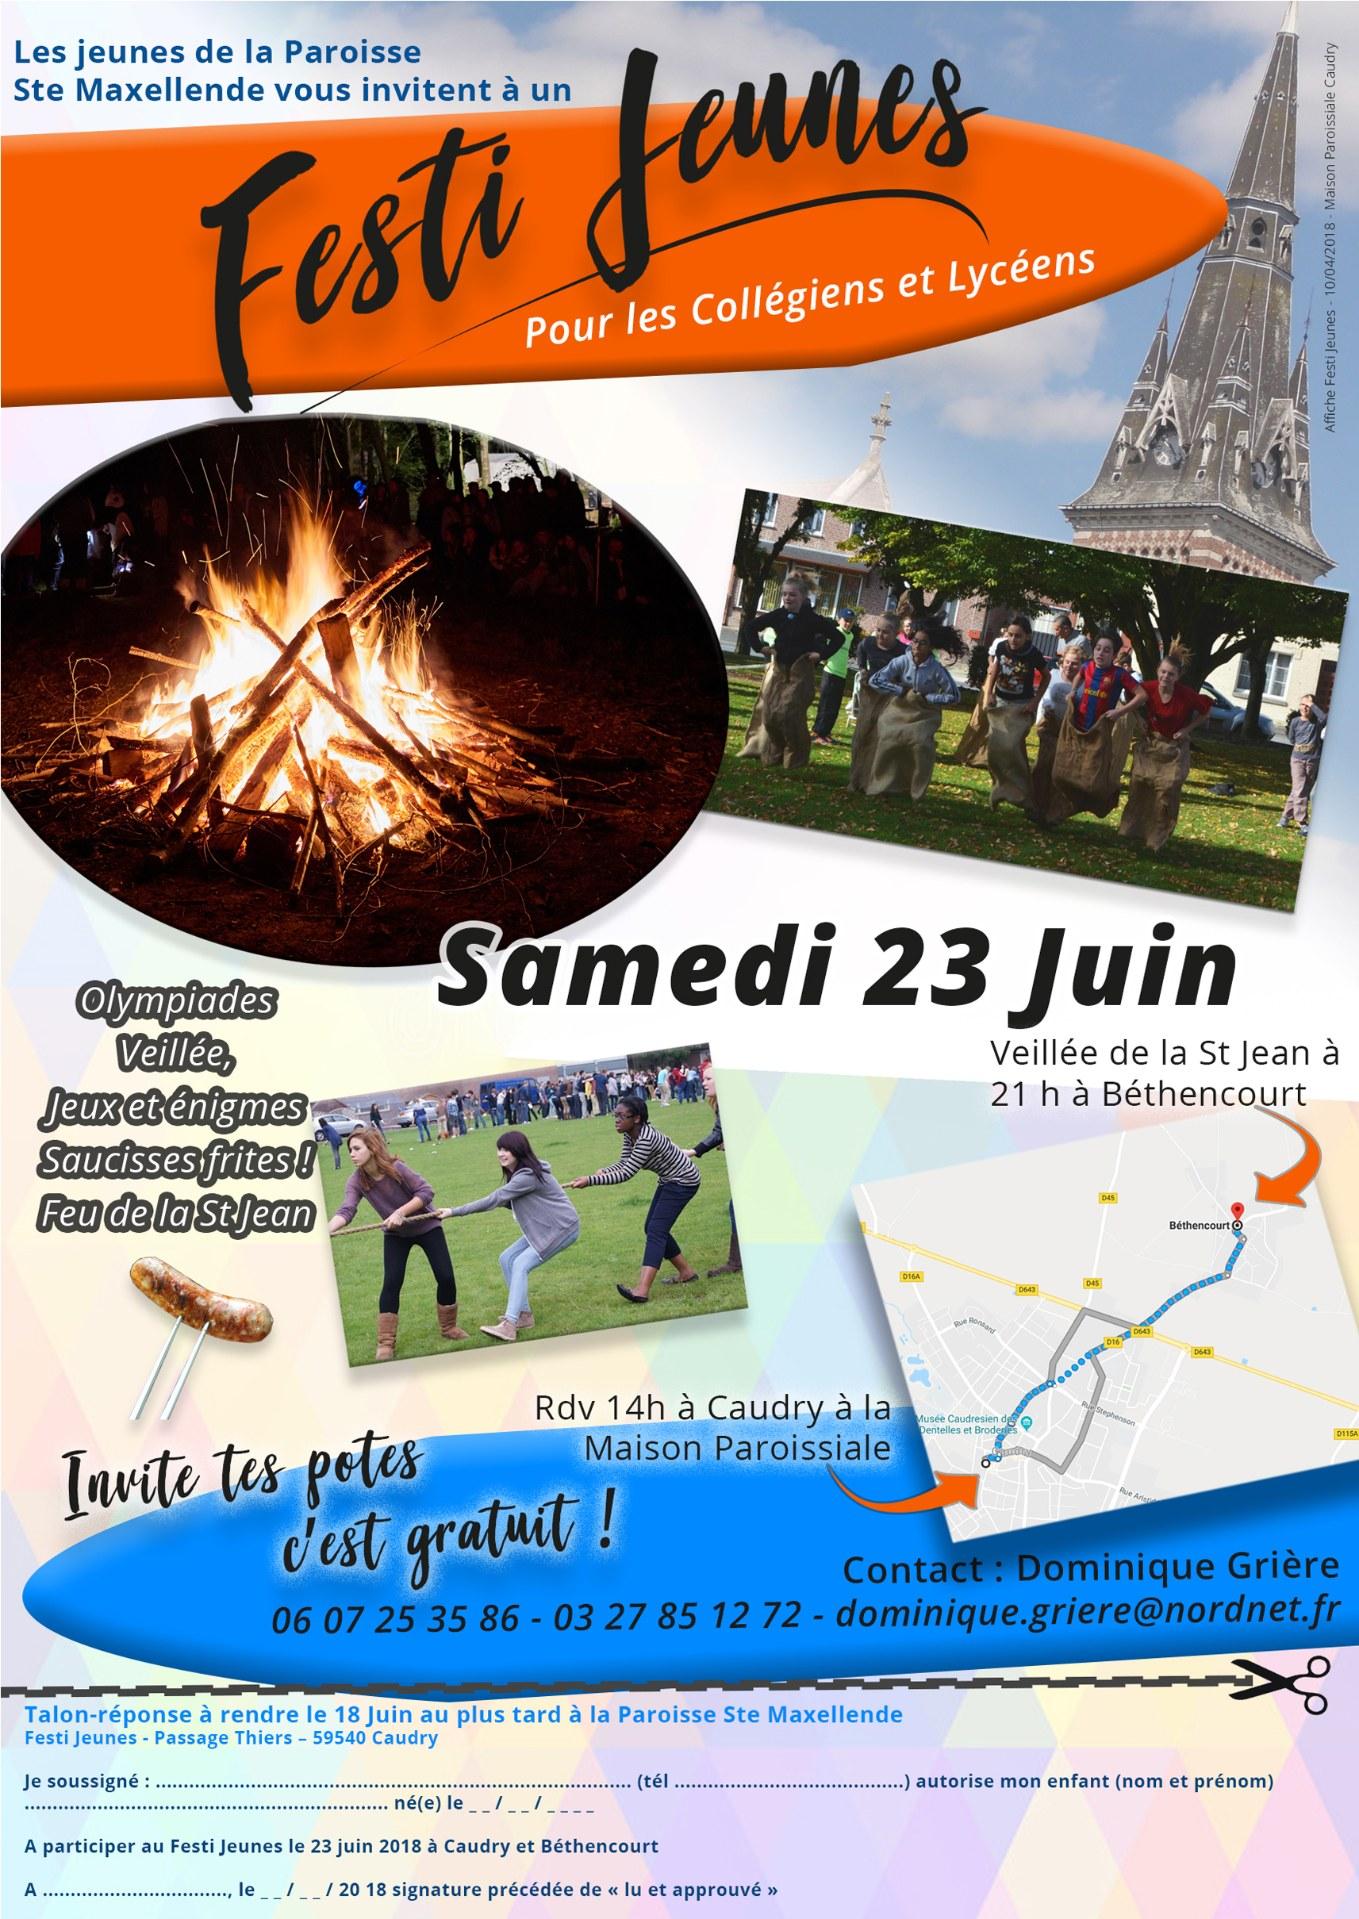 Flyer Festi Jeunes Caudry